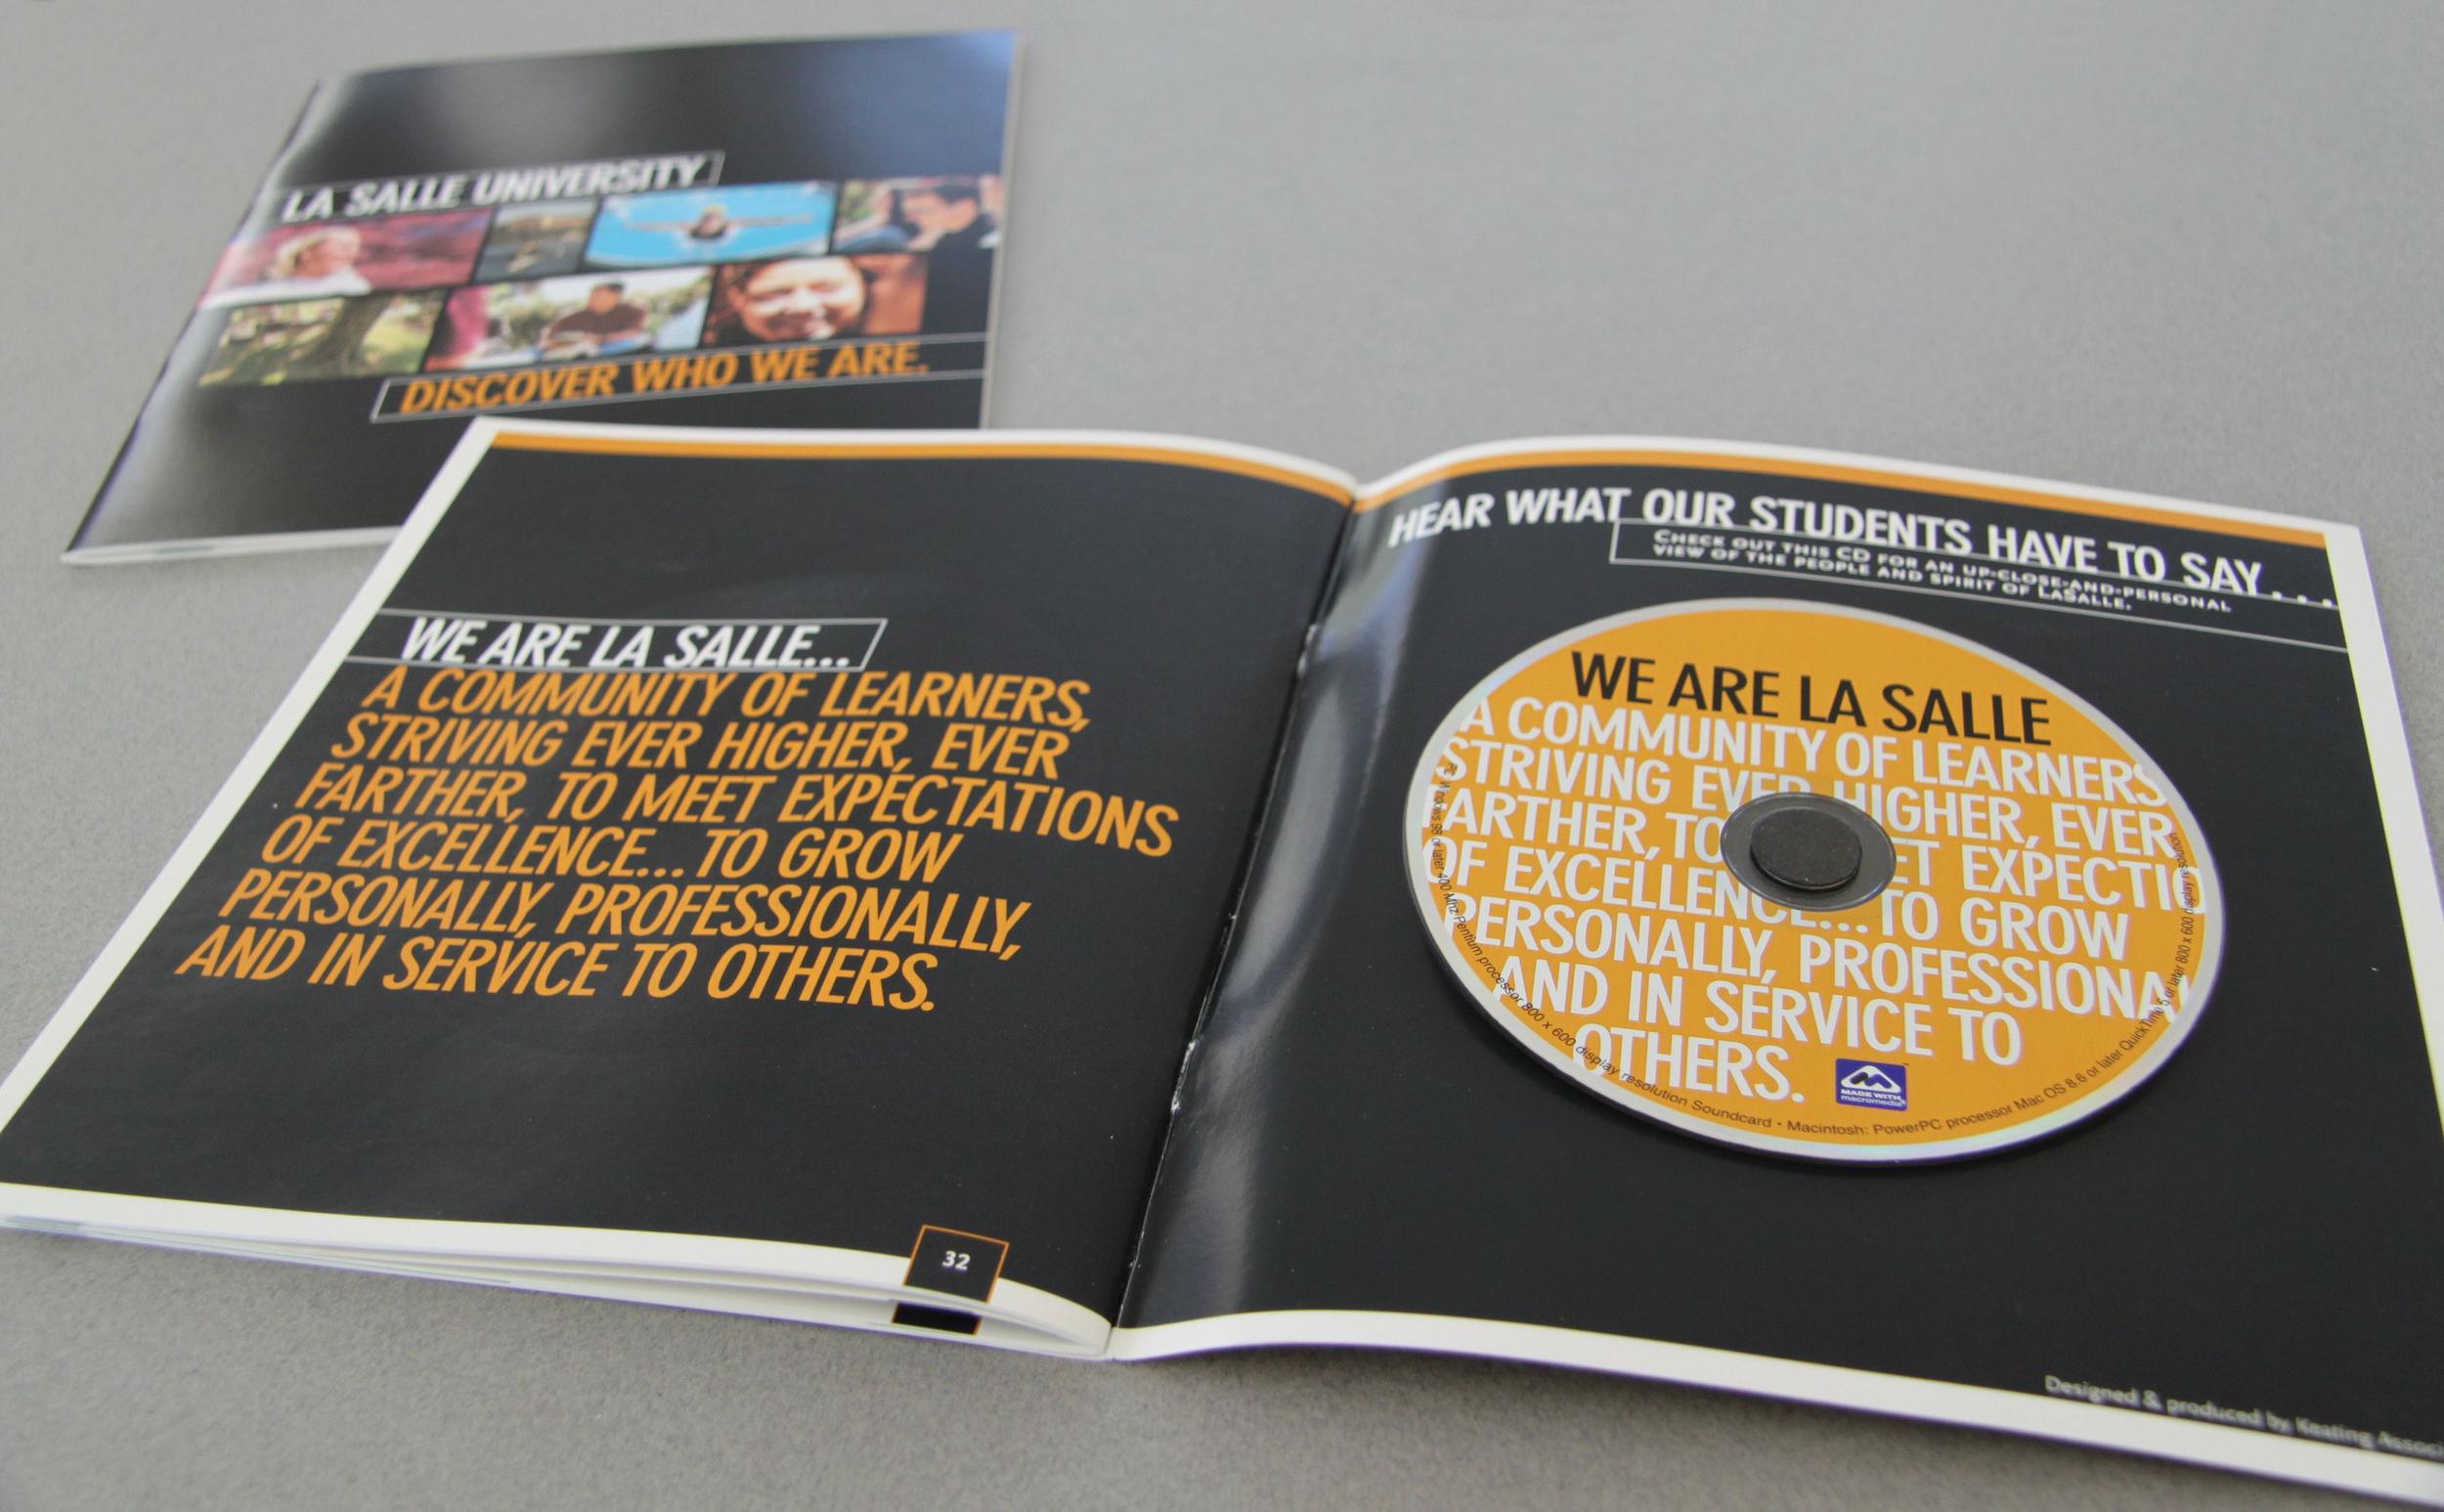 LaSalle University Viewbook